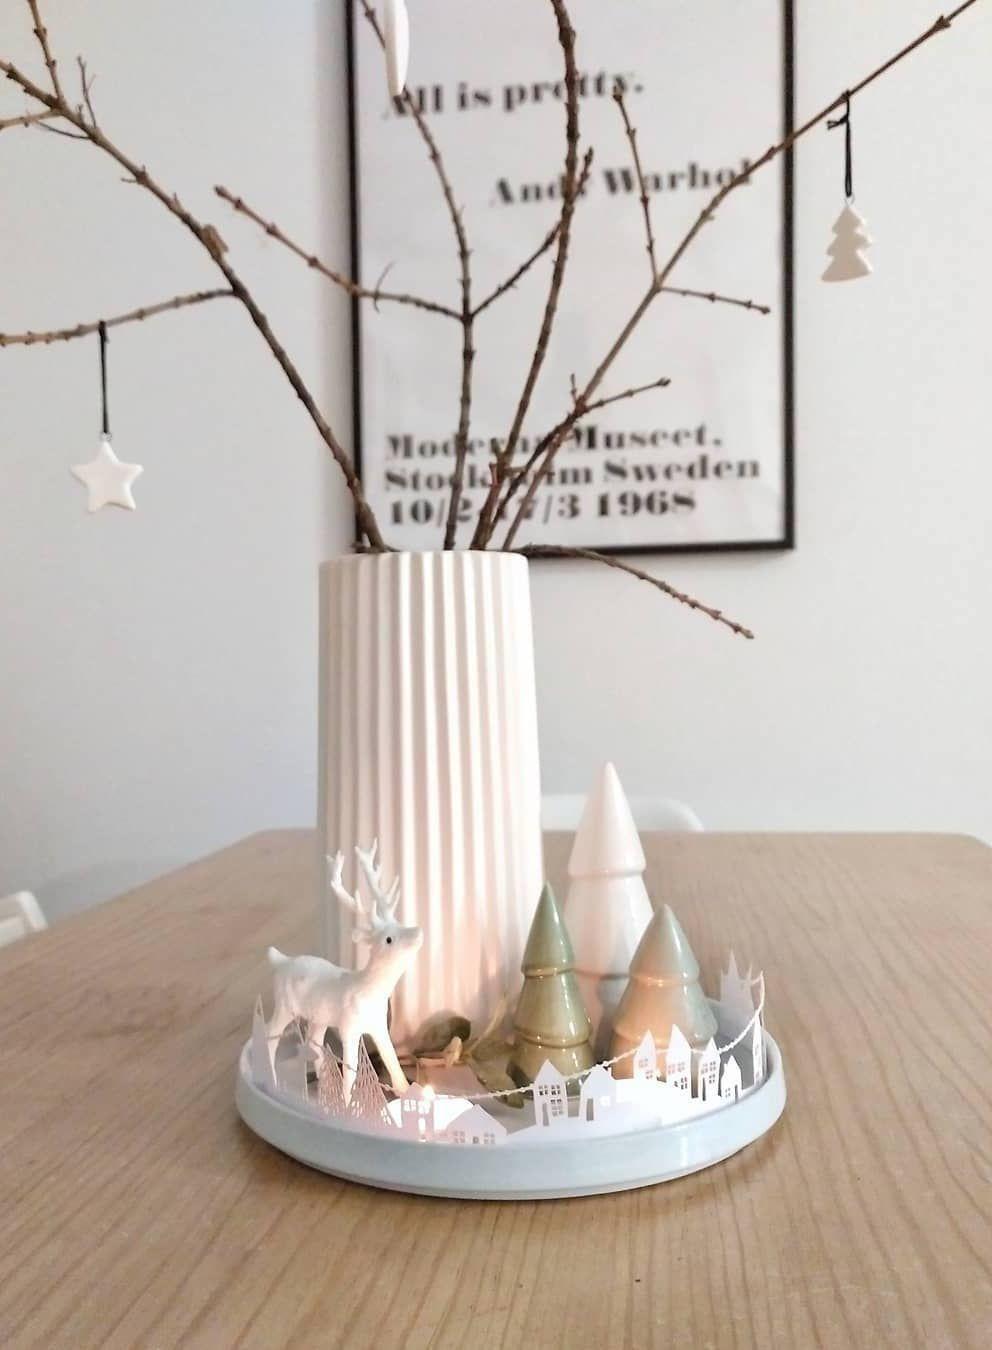 Scandi Christmas Centerpiece Decor via @peli_pecas